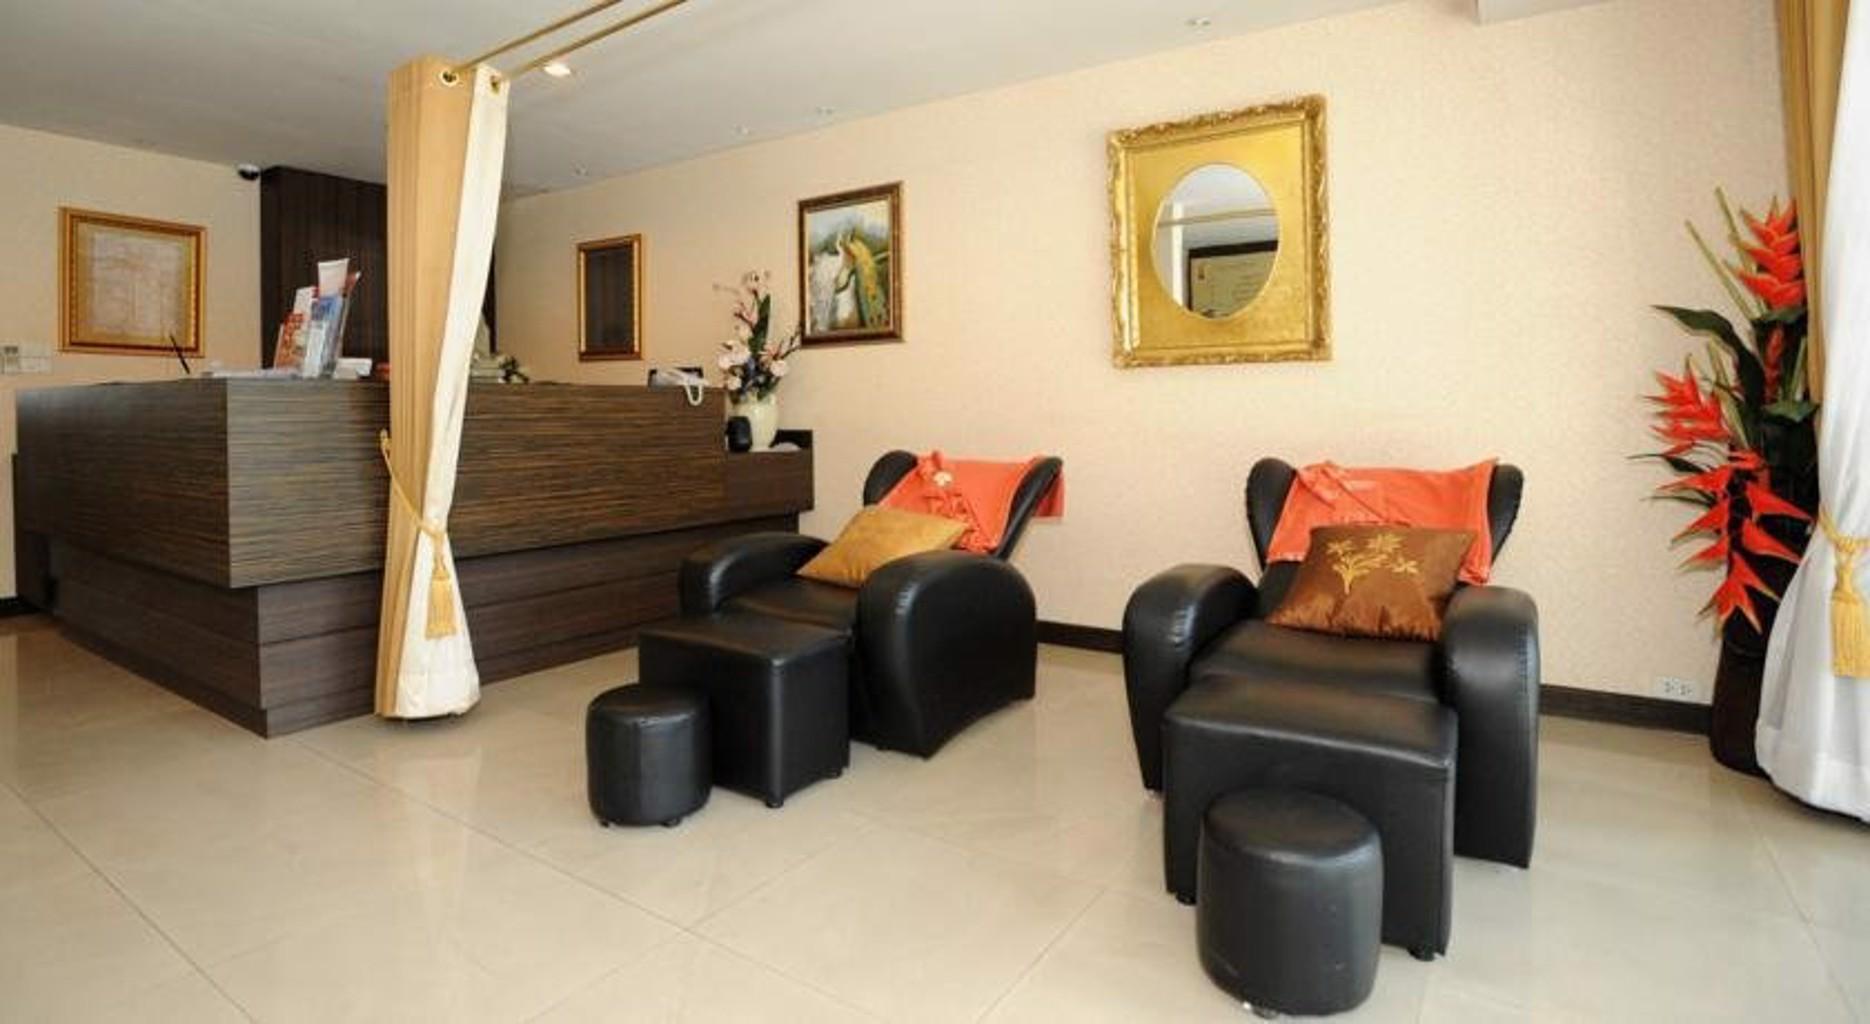 Gallery image of Lilla Hotel